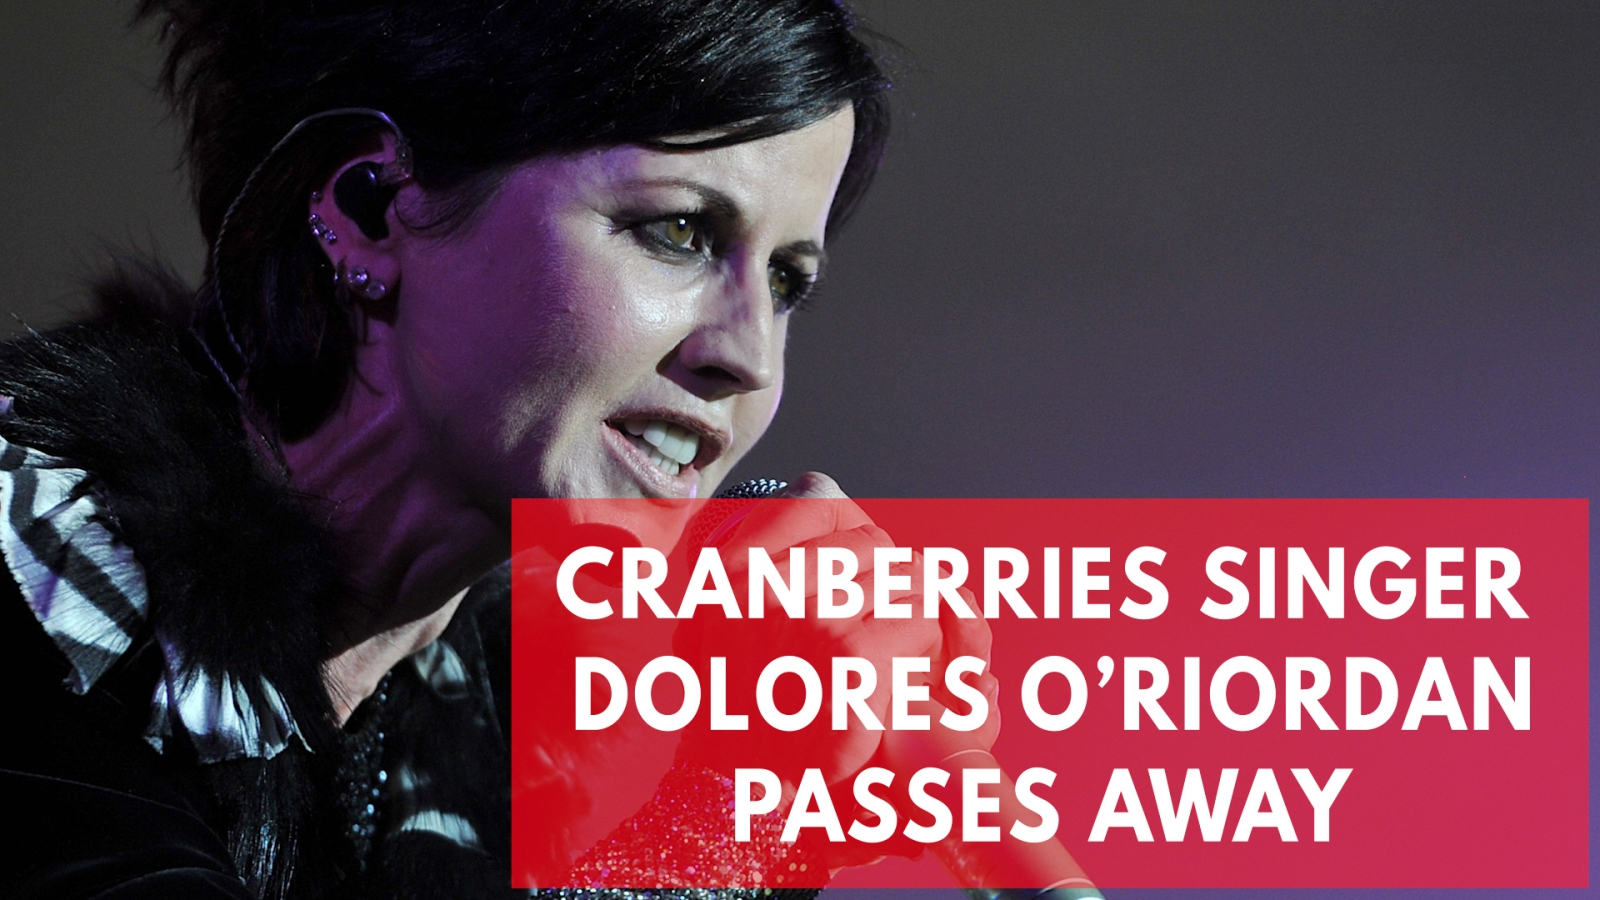 dolores-oriordan-dead-cranberries-singer-passes-away-at-age-46